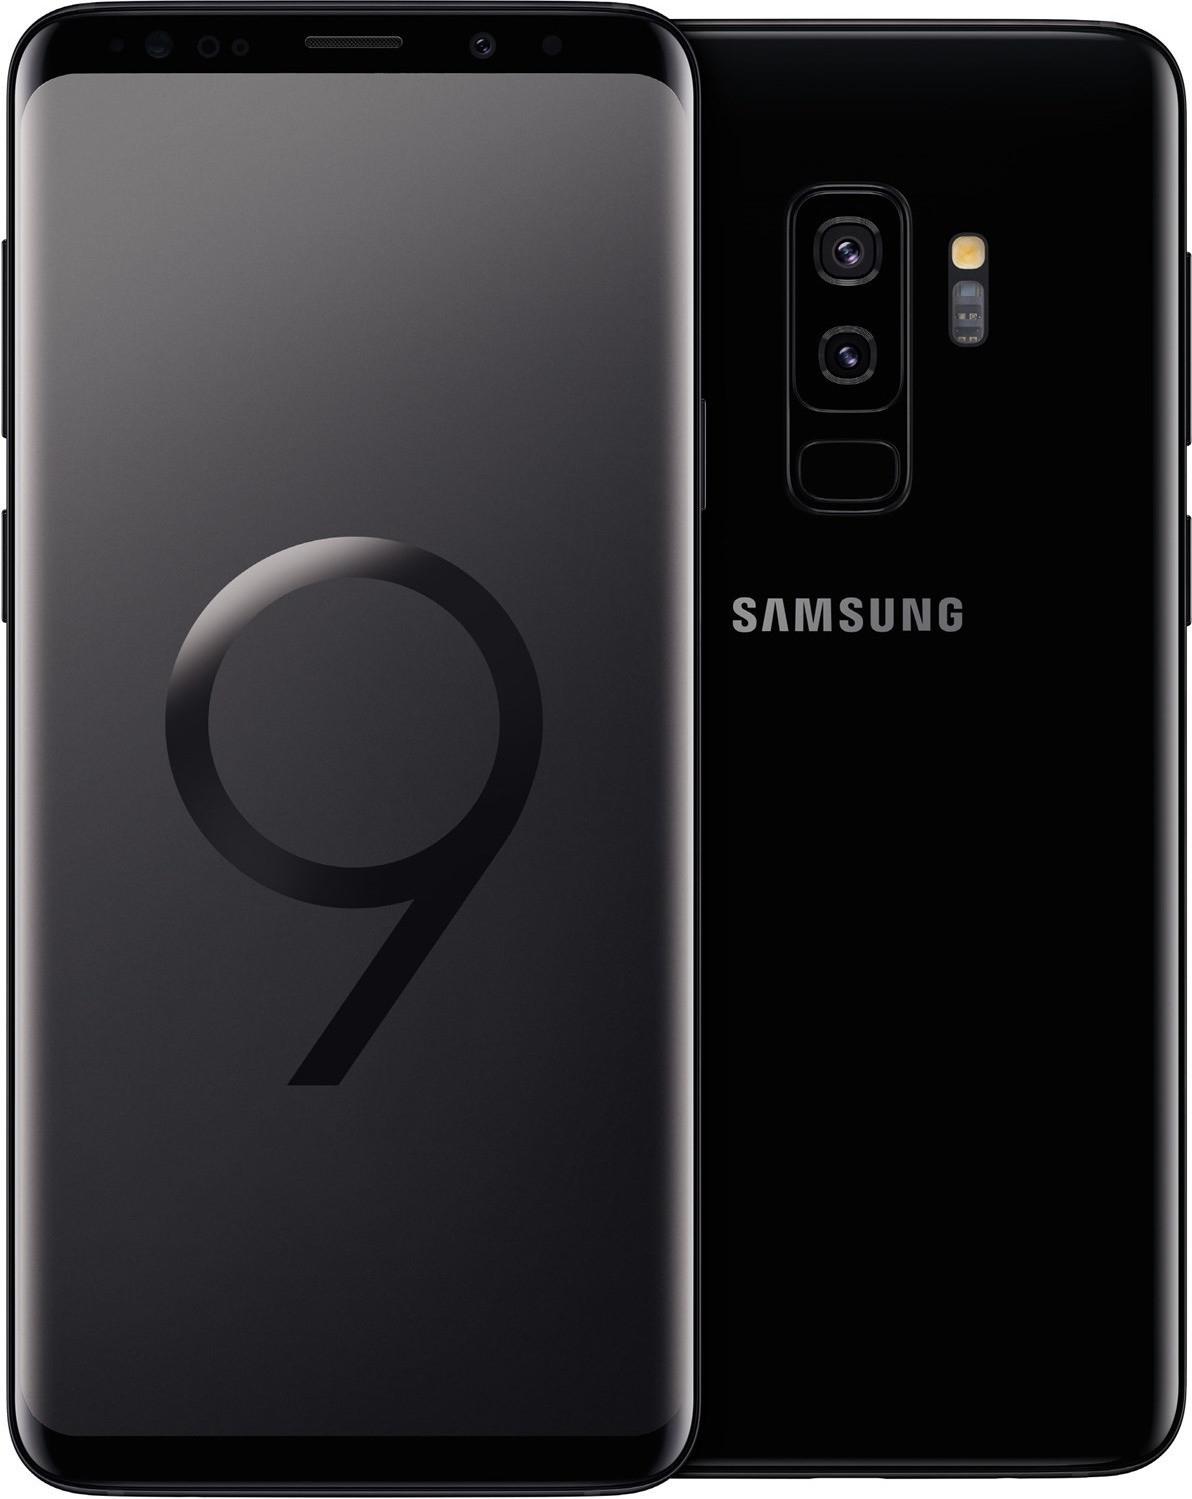 "Smartphone 6.2"" Samsung Galaxy S9+ - WQHD+, Exynos 9810, 6 Go de RAM, 64 Go, différents coloris"